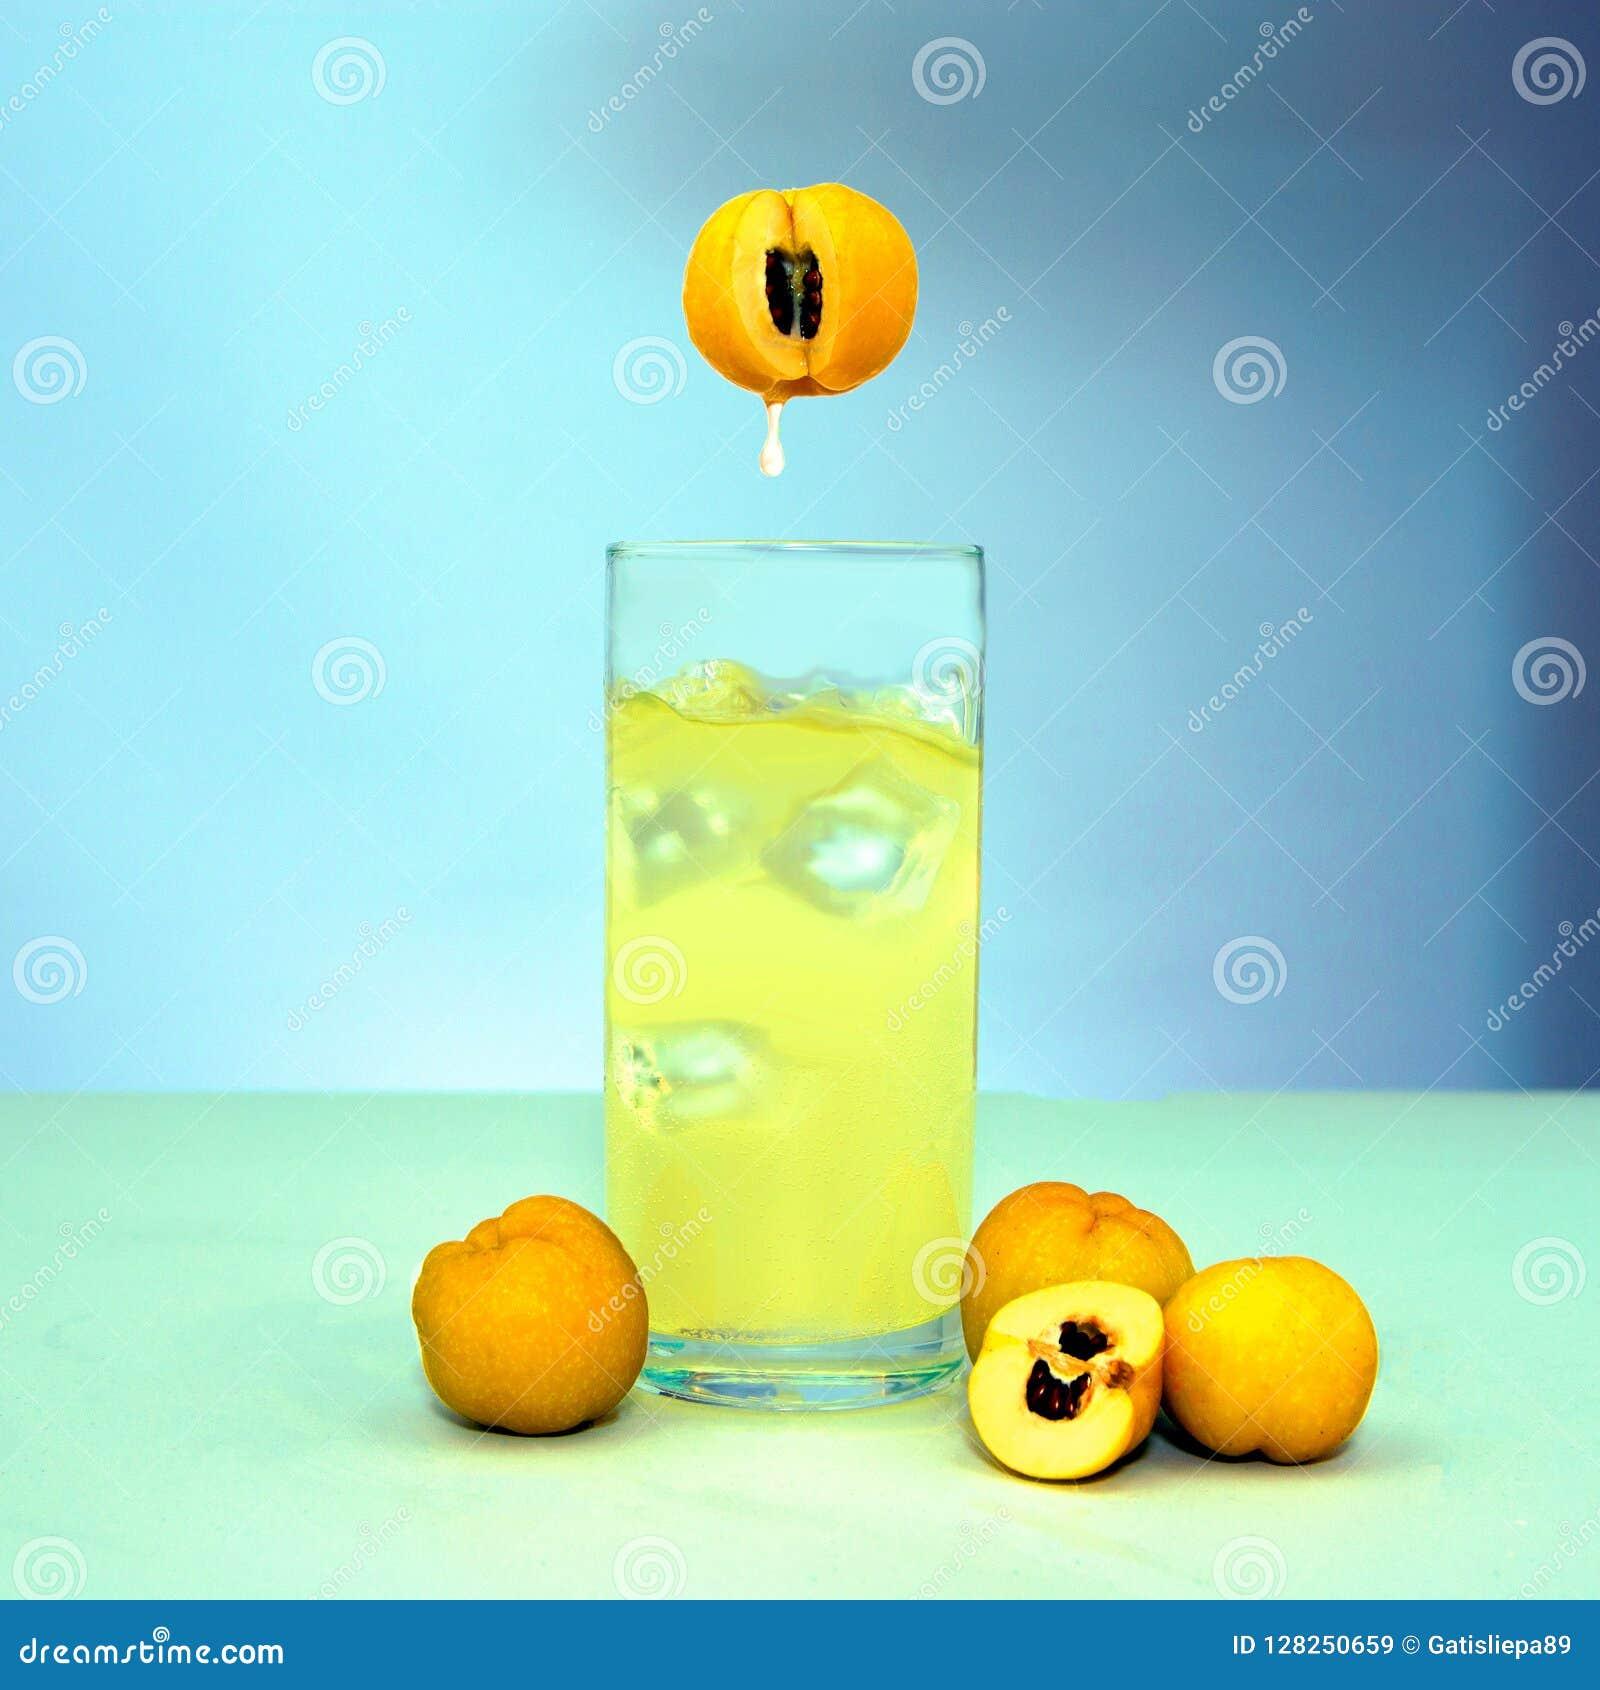 Fruite juice splash isolated on white and the ice